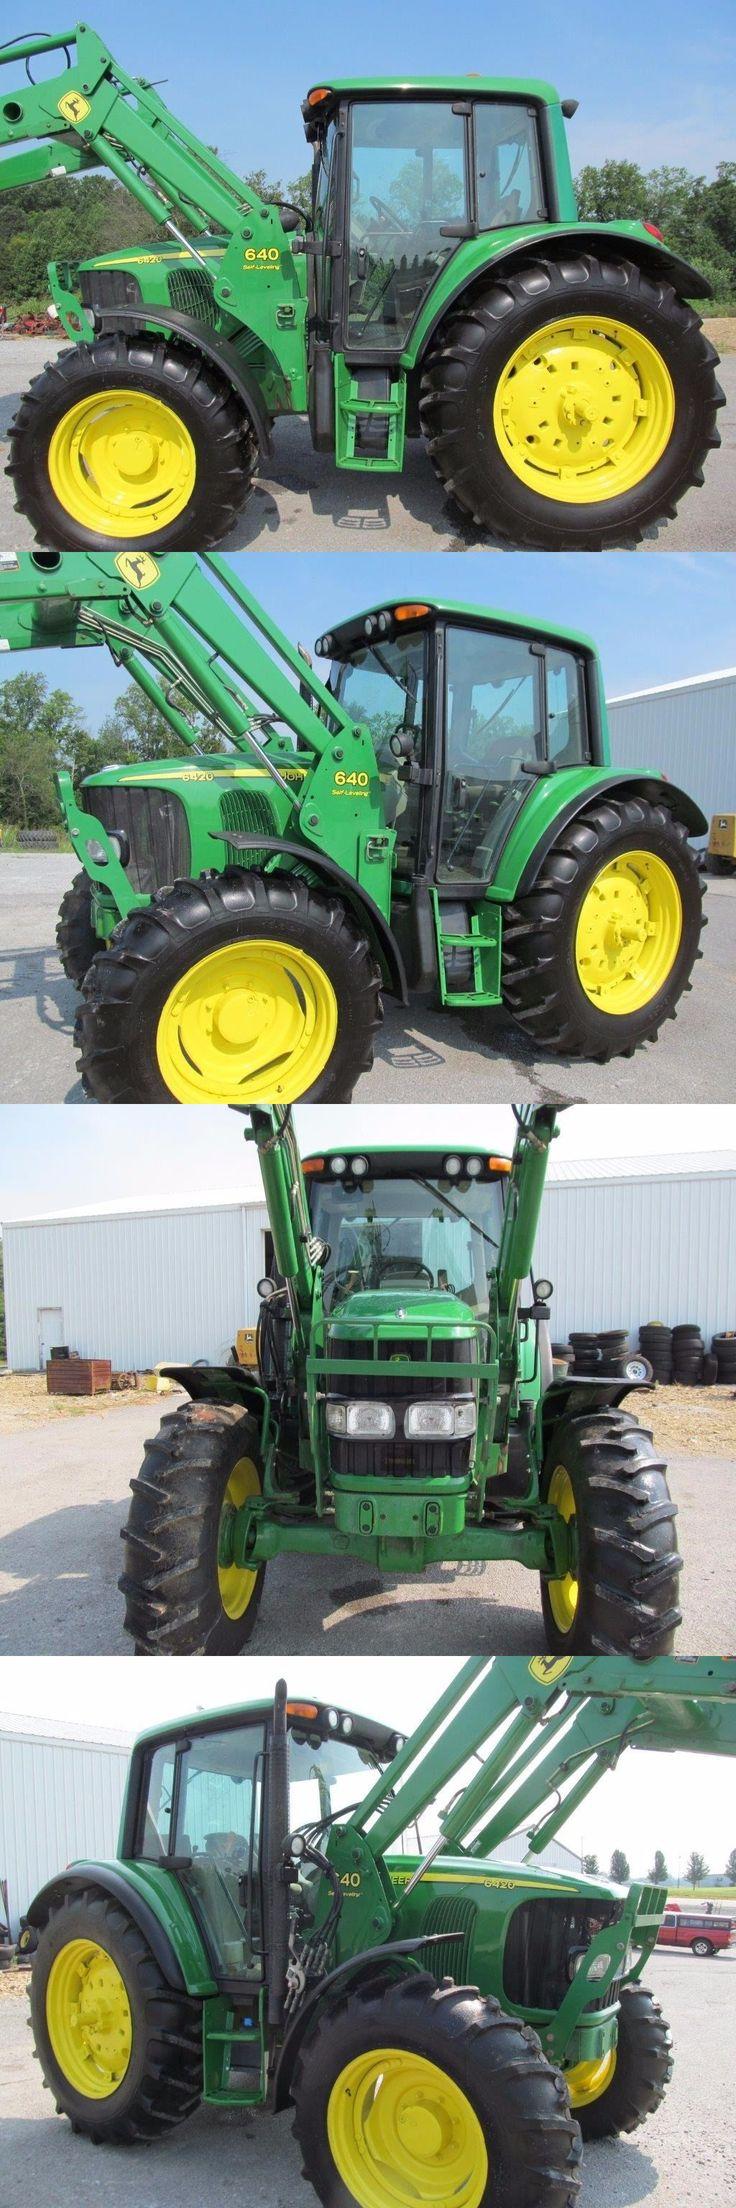 John Deere 6420 Diesel Tractor 4 X 4 With Cab &... - Exclusively on #priceabate #priceabateHeavyEquipments! BUY IT NOW ONLY $50299